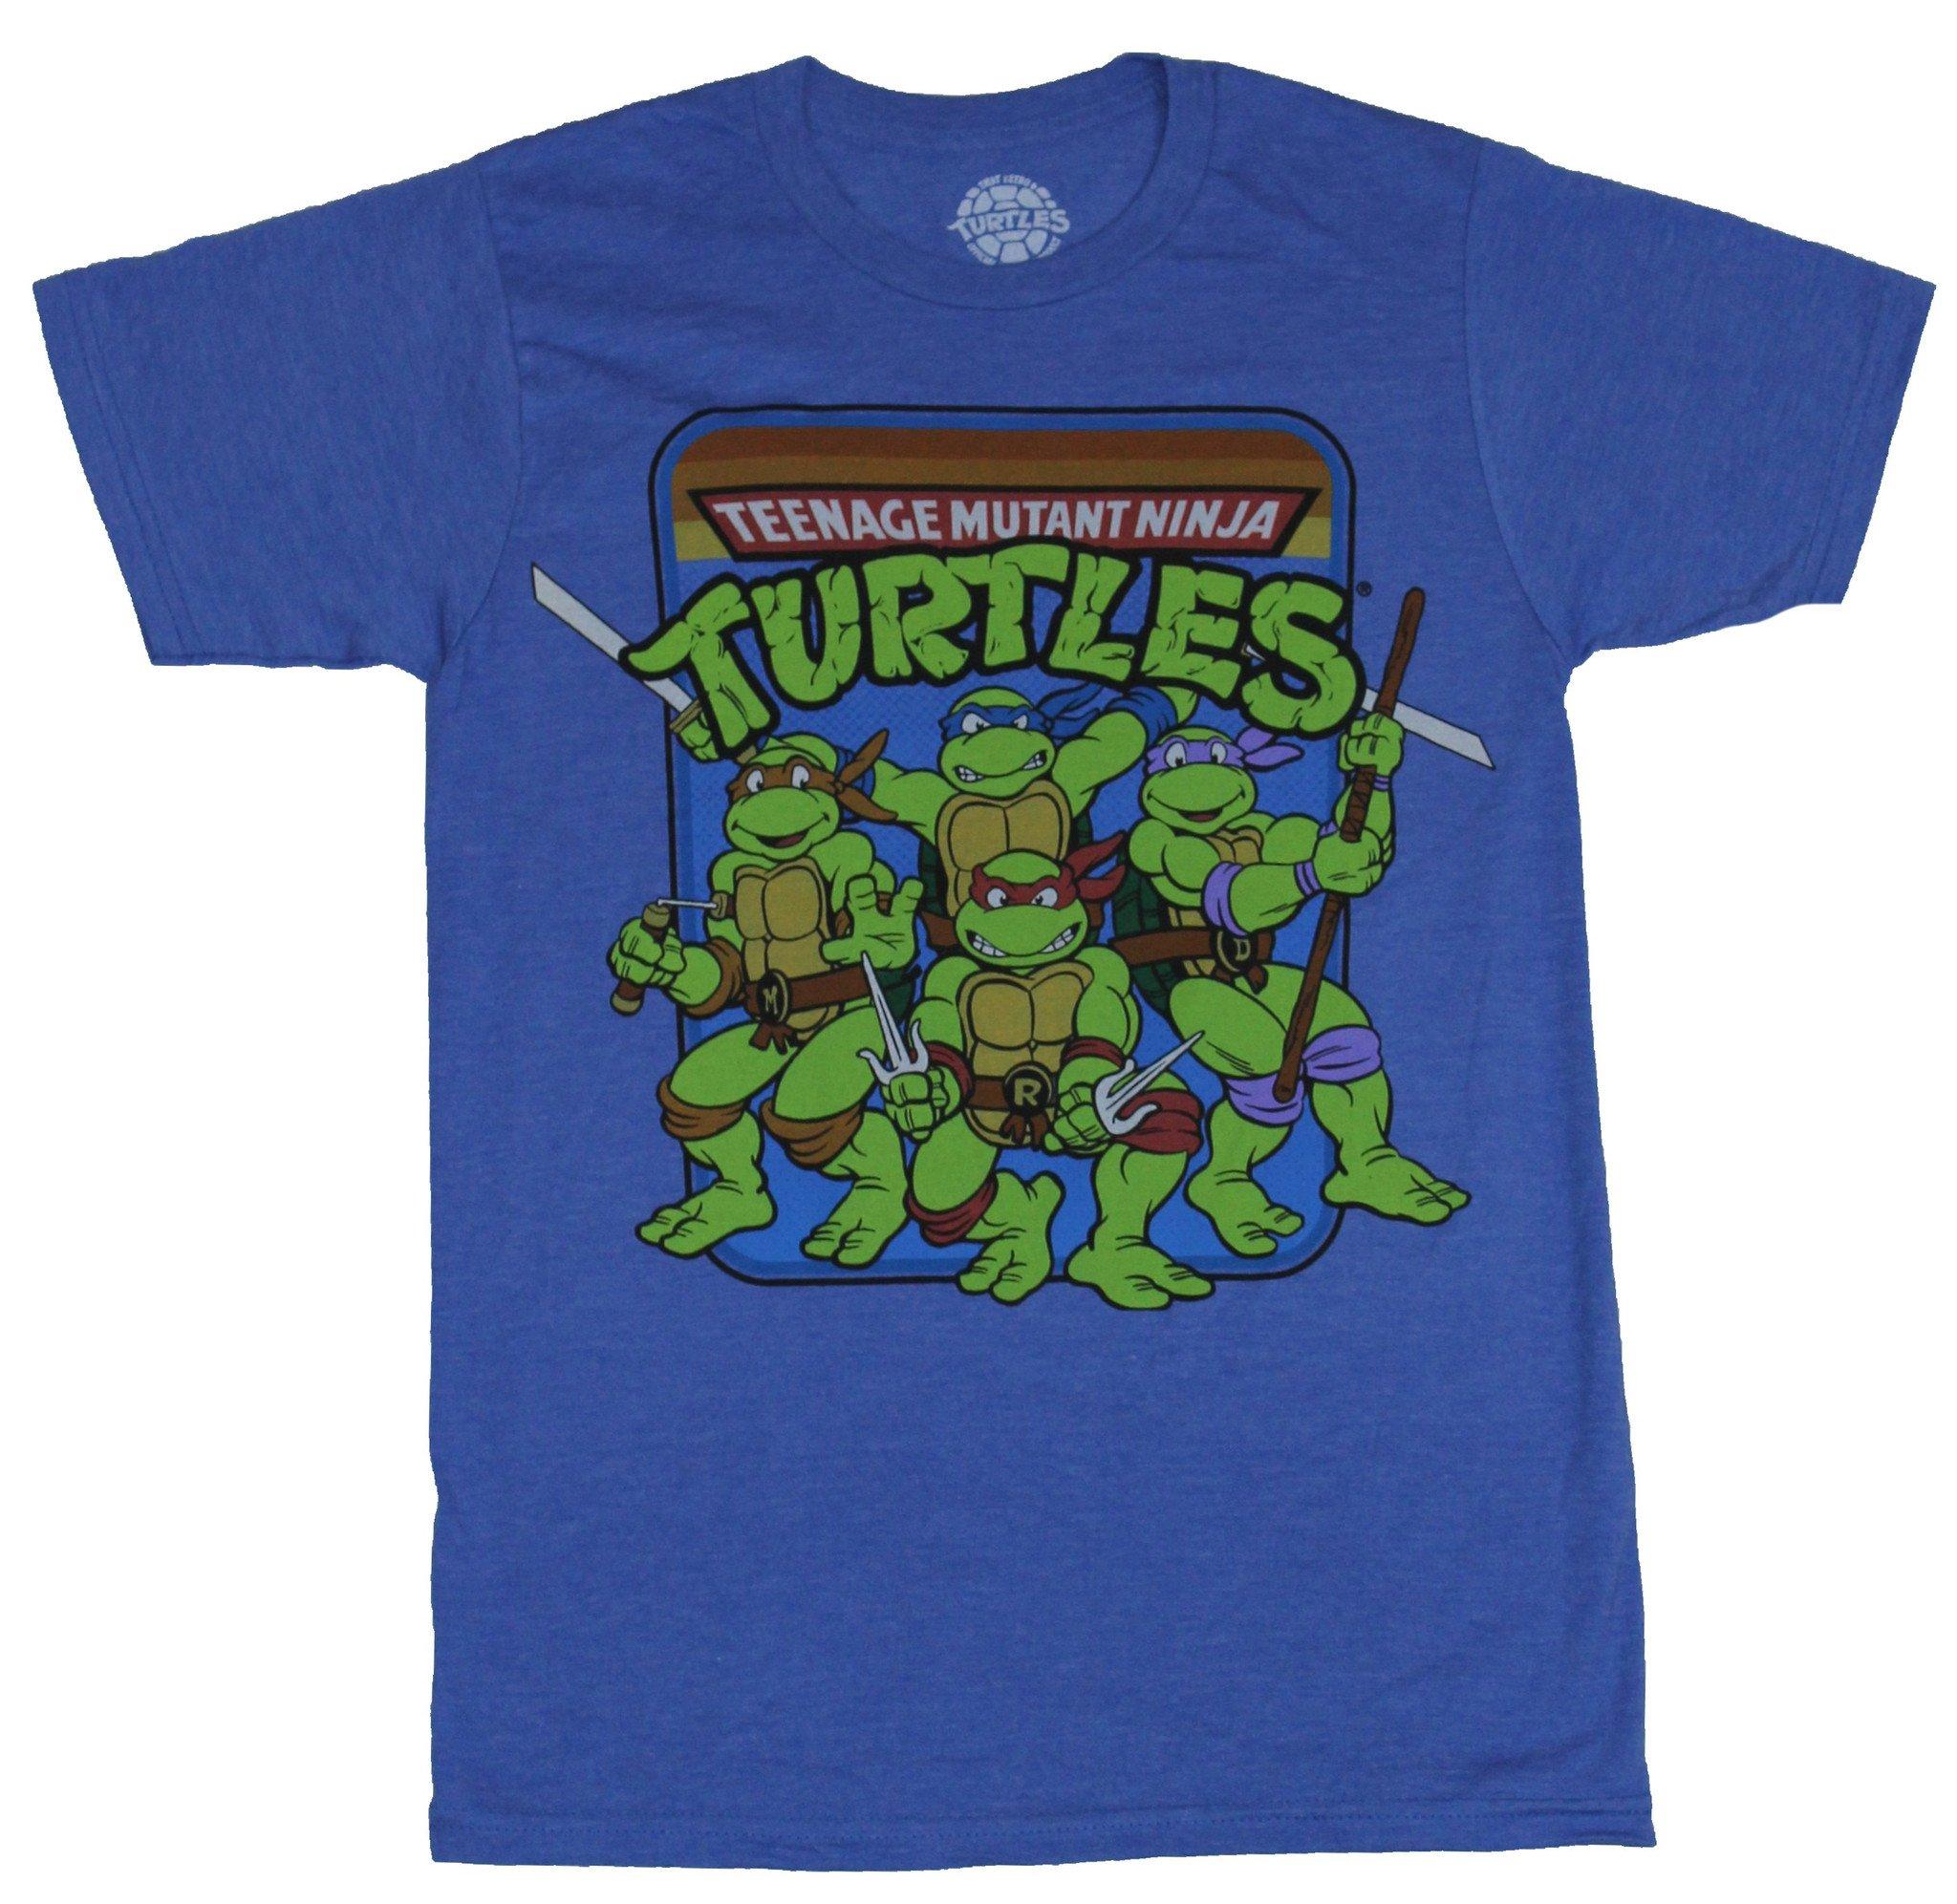 Teenage Mutant Ninja Turtles Mens T-Shirt -  Group Under Multicolor Logo